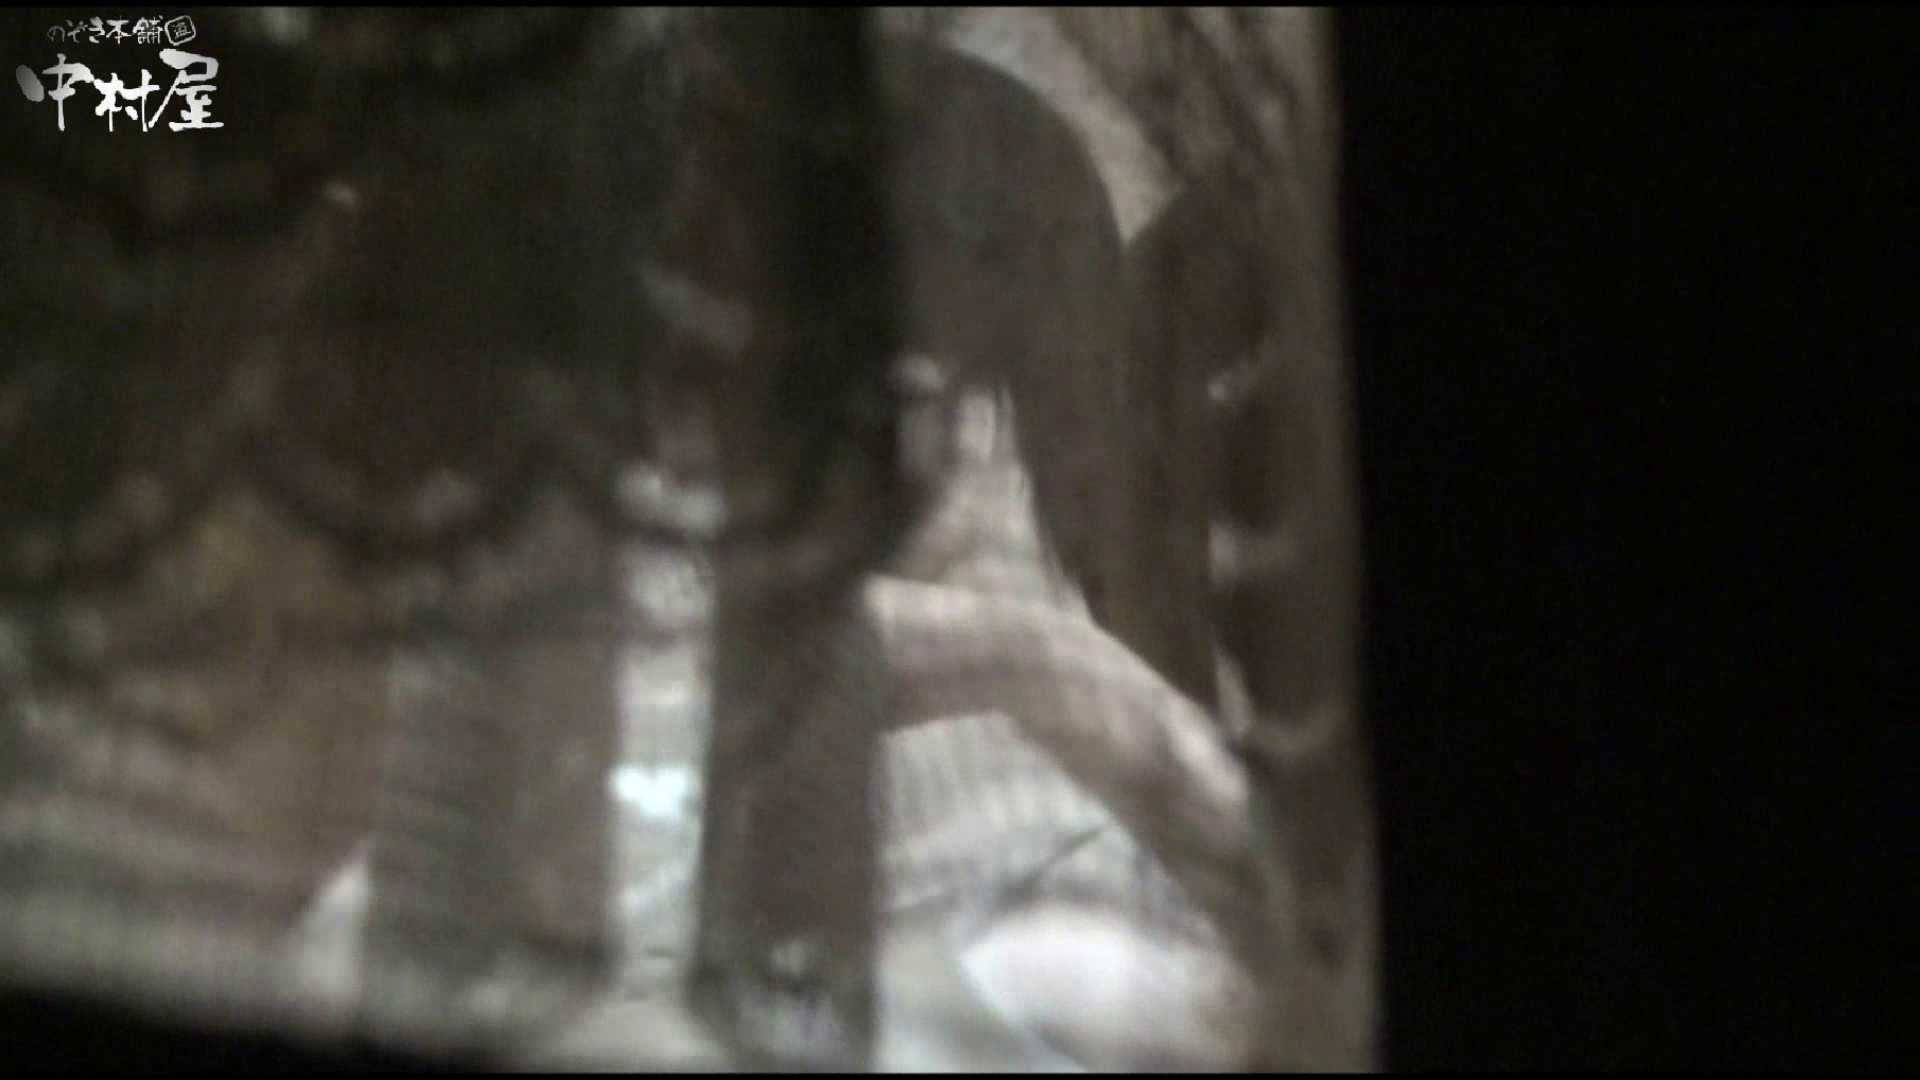 民家風呂専門盗撮師の超危険映像 vol.028 OLハメ撮り  28Pix 6